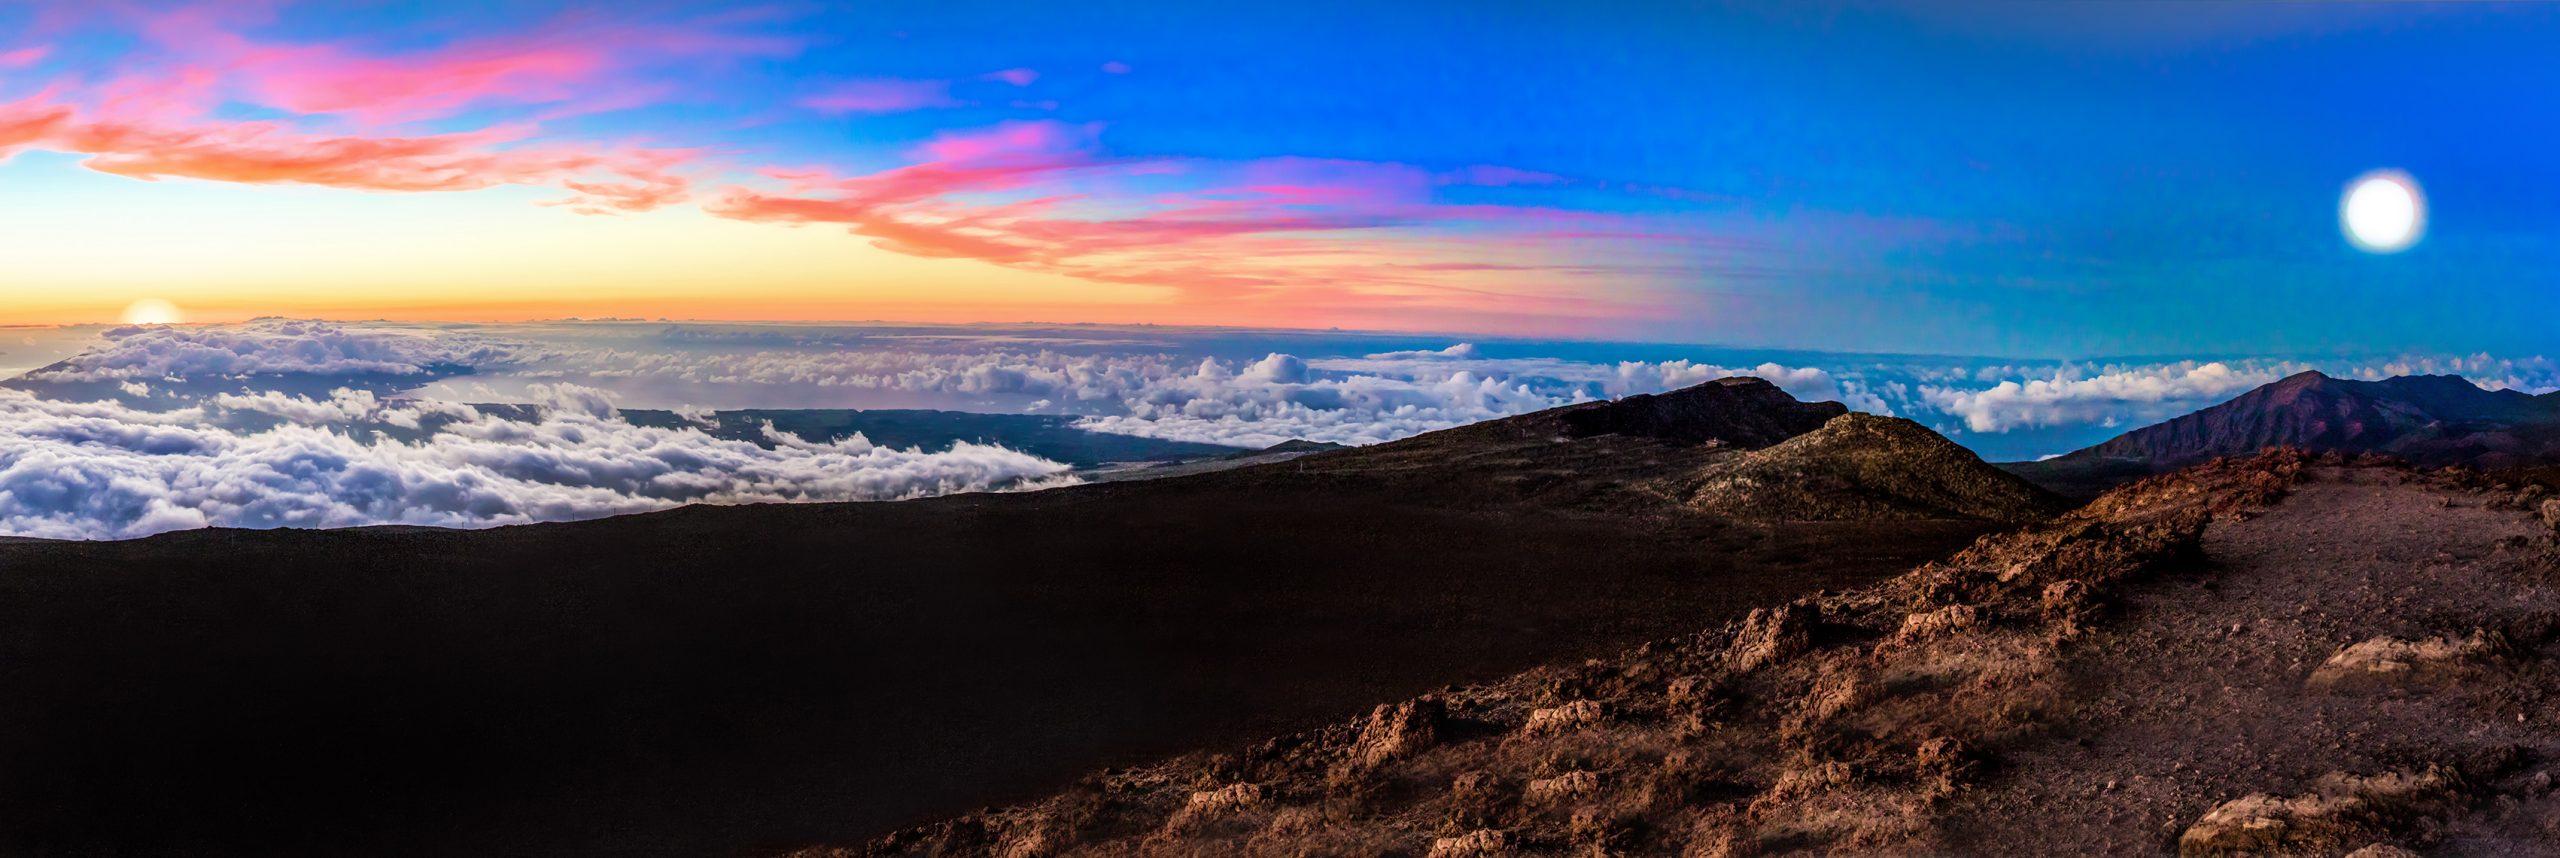 Haleakala Rise Set by Davin Phelps